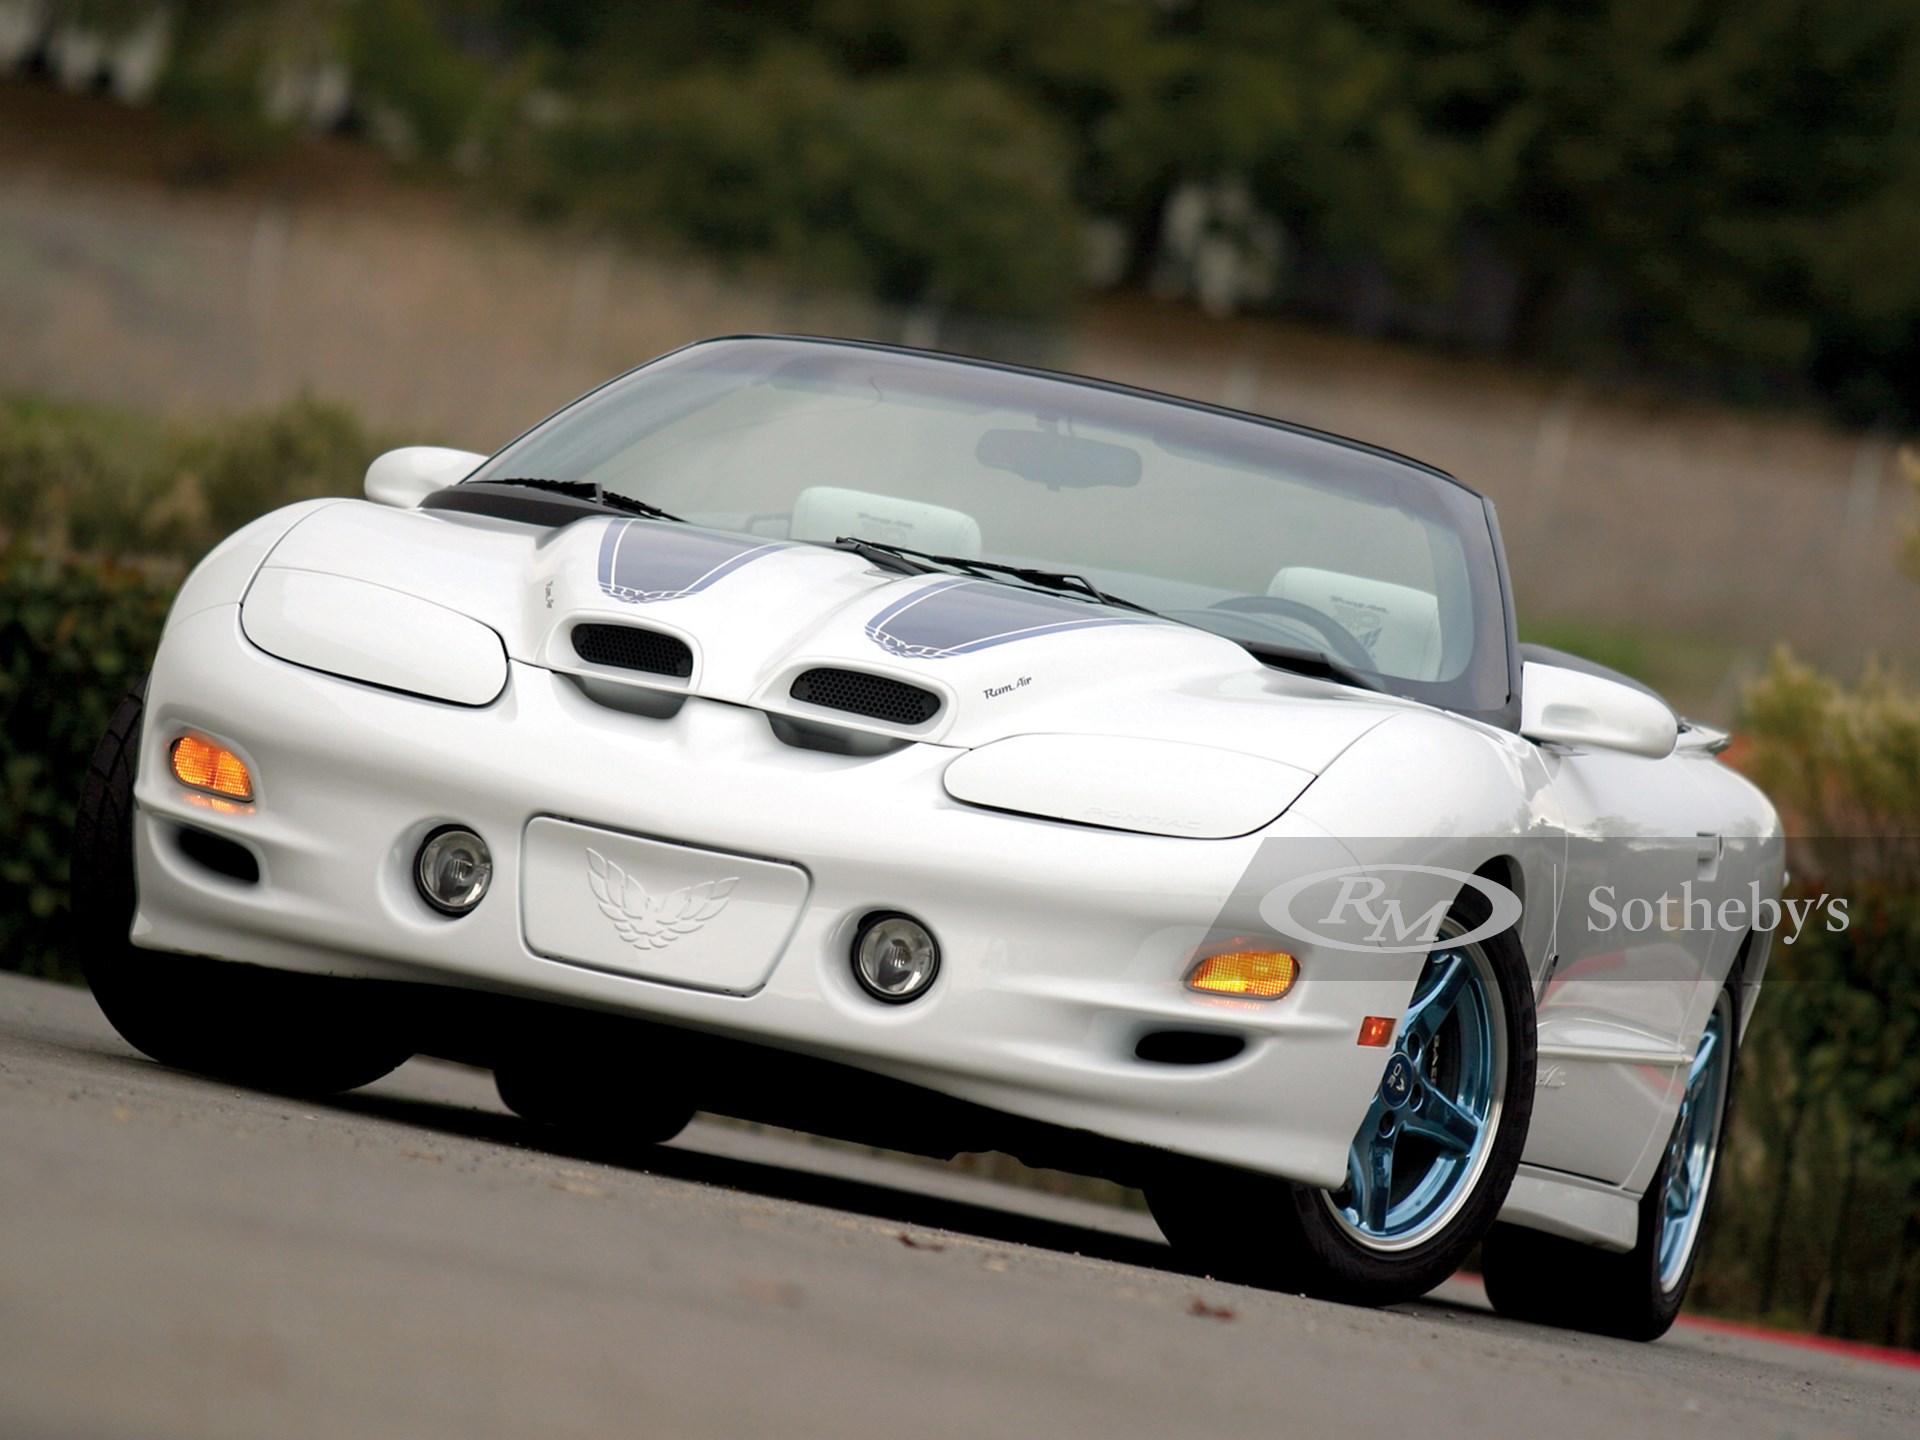 1999 Pontiac Firebird Trans Am 30th Anniversary Special Edition Convertible